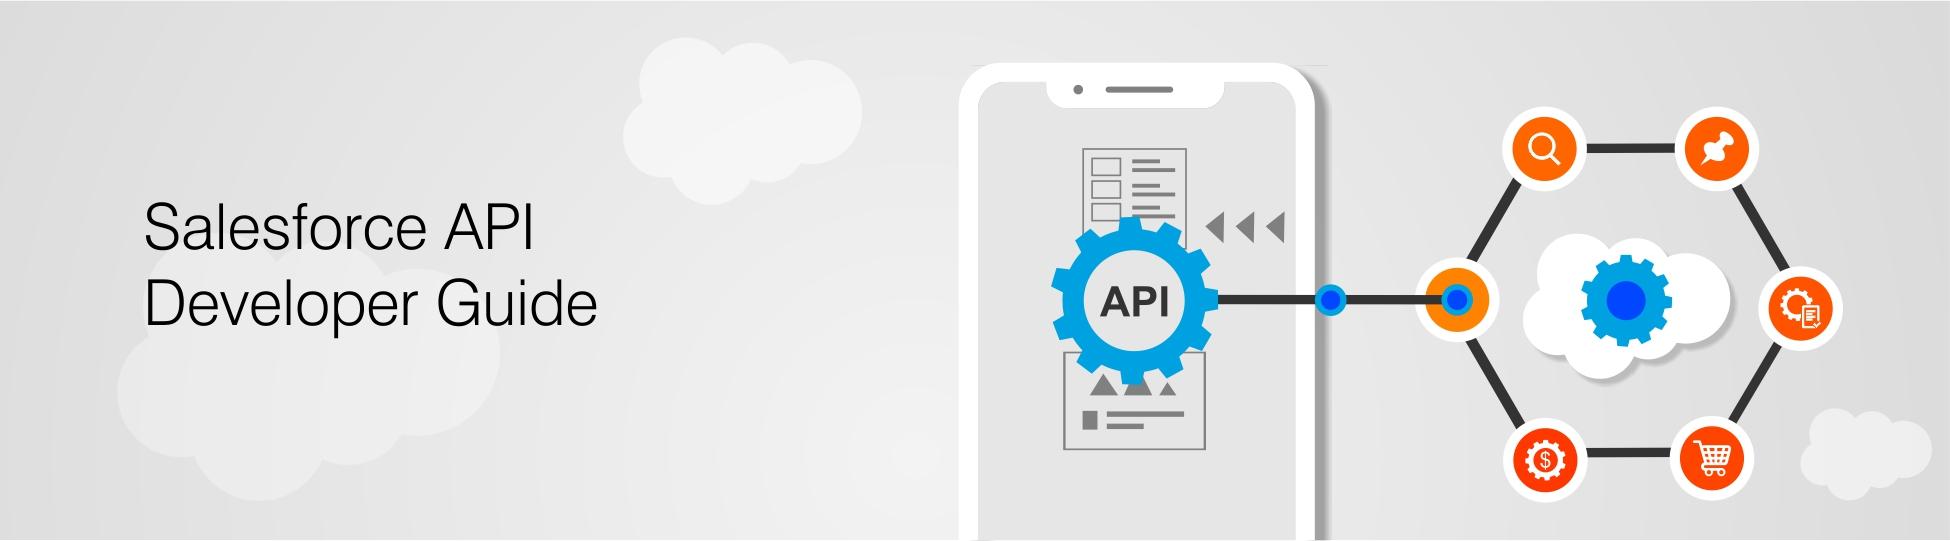 Salesforce API Developer Guide